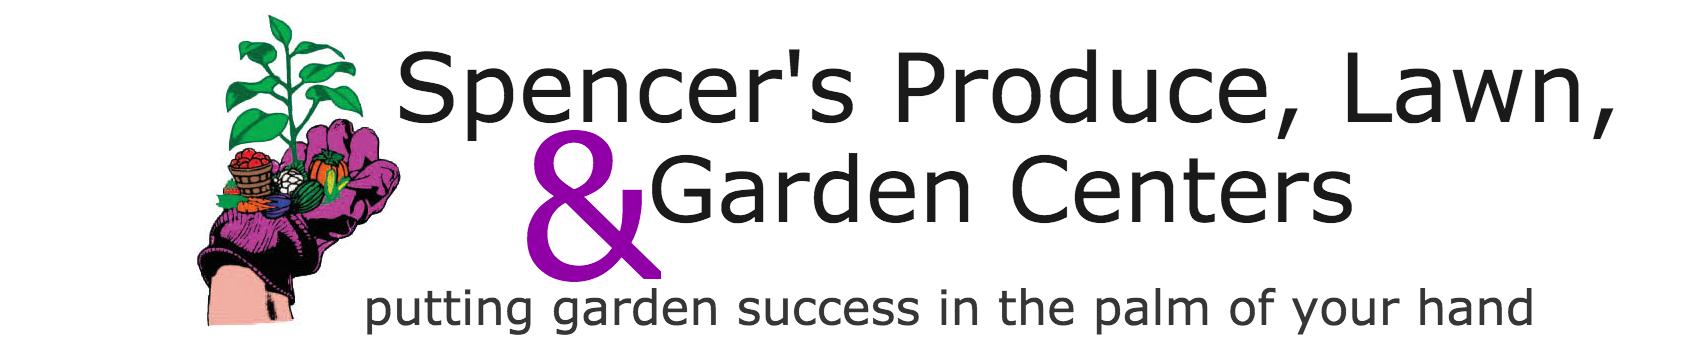 Spencer's Produce, Lawn, & Garden Centers, Inc